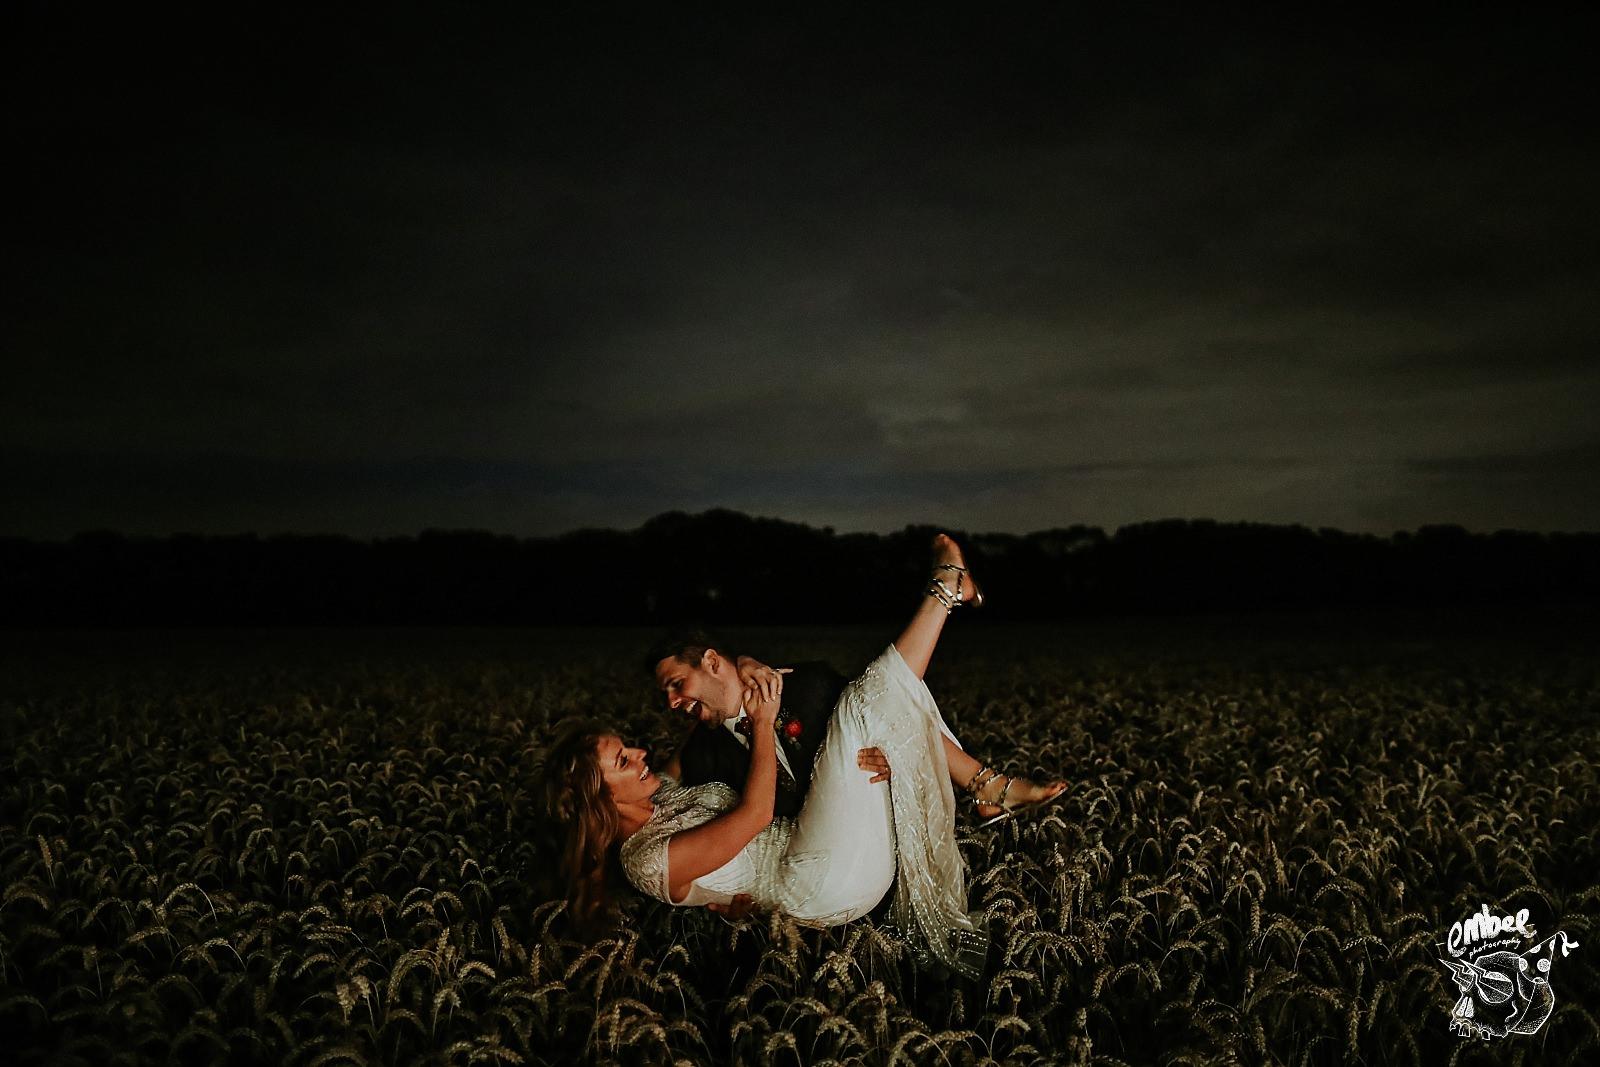 groom picks up bride in wheatfield